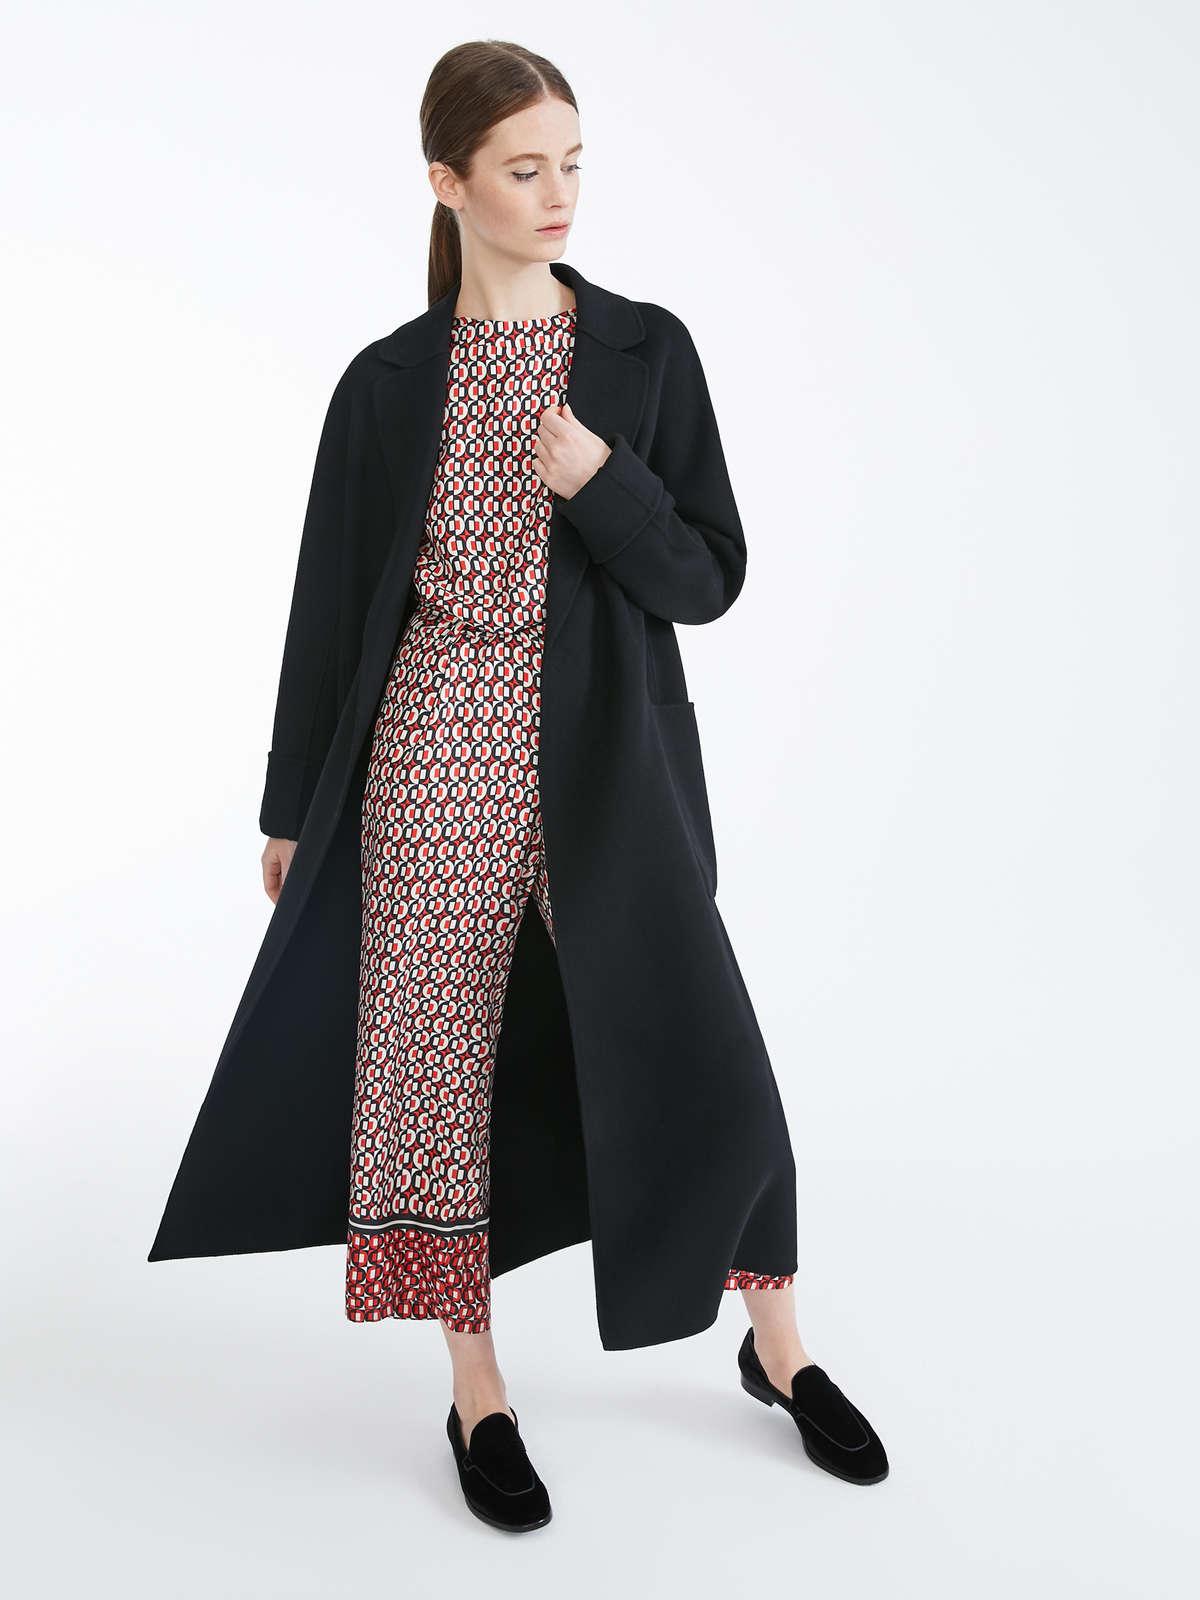 Algeri Coat by Max Mara, available on maxmara.com for EUR733 Angelina Jolie Outerwear Exact Product